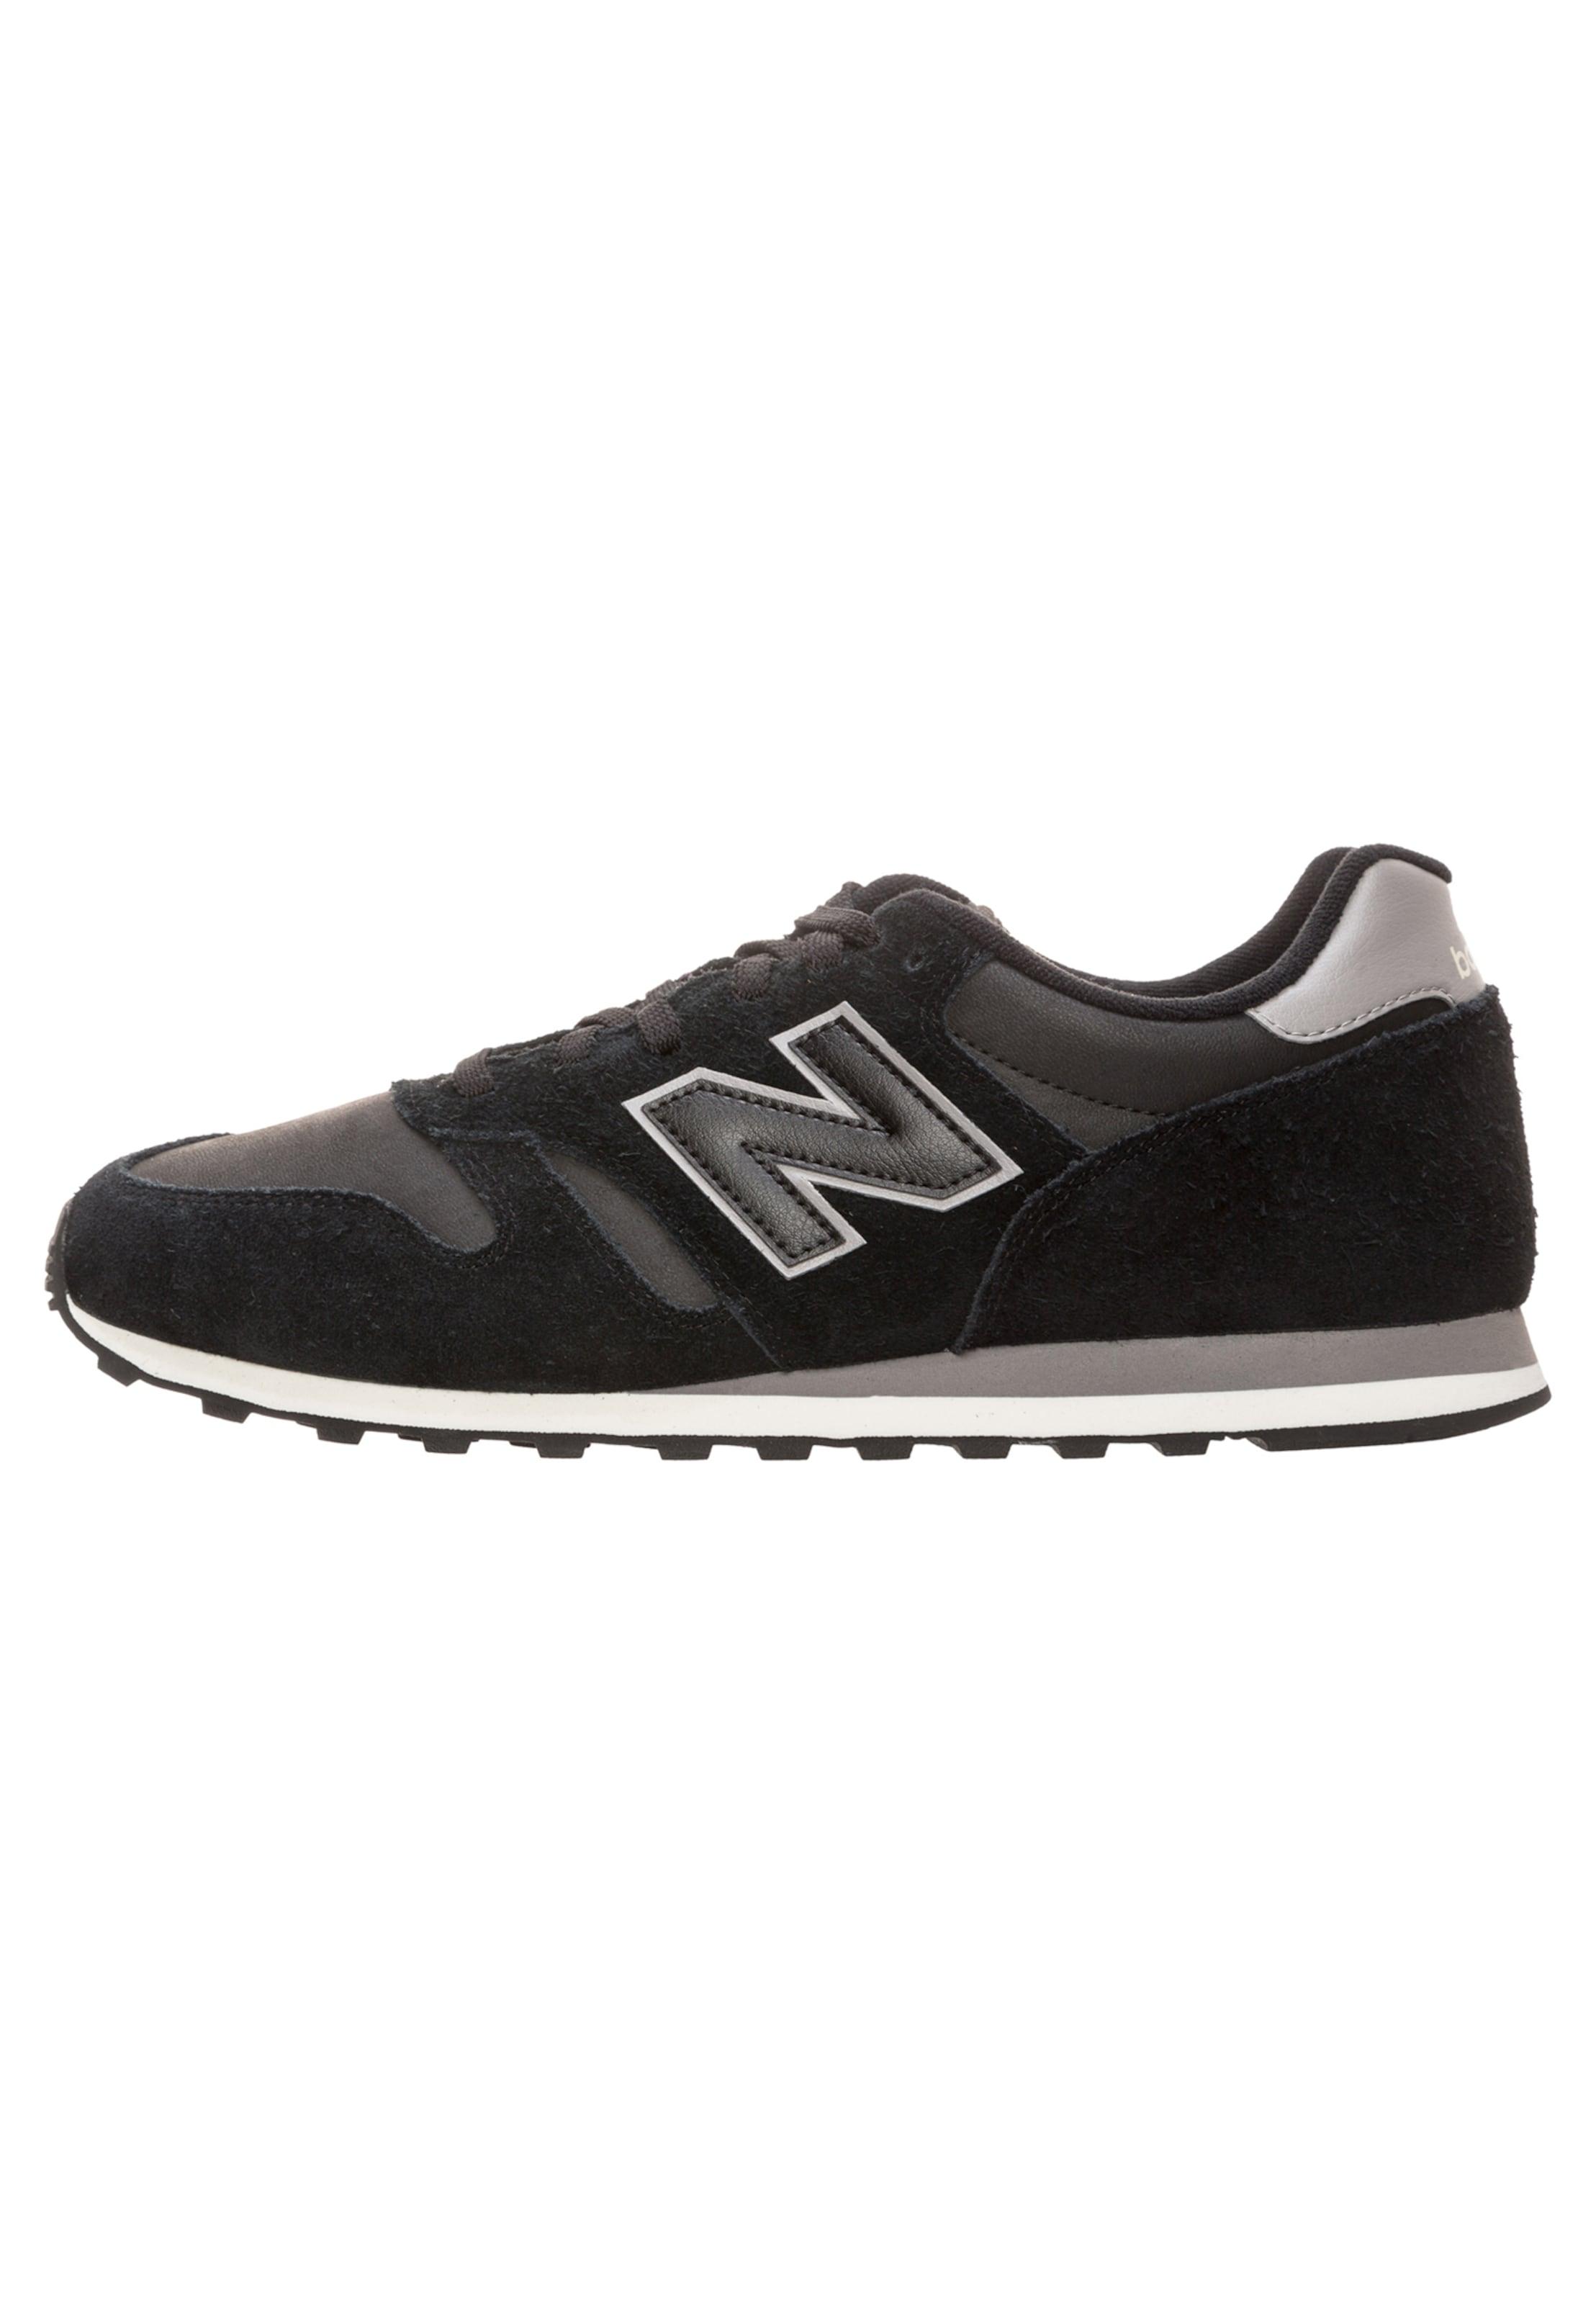 D' SchwarzWeiß New 'ml373 In Sneaker Balance vfgbY76y